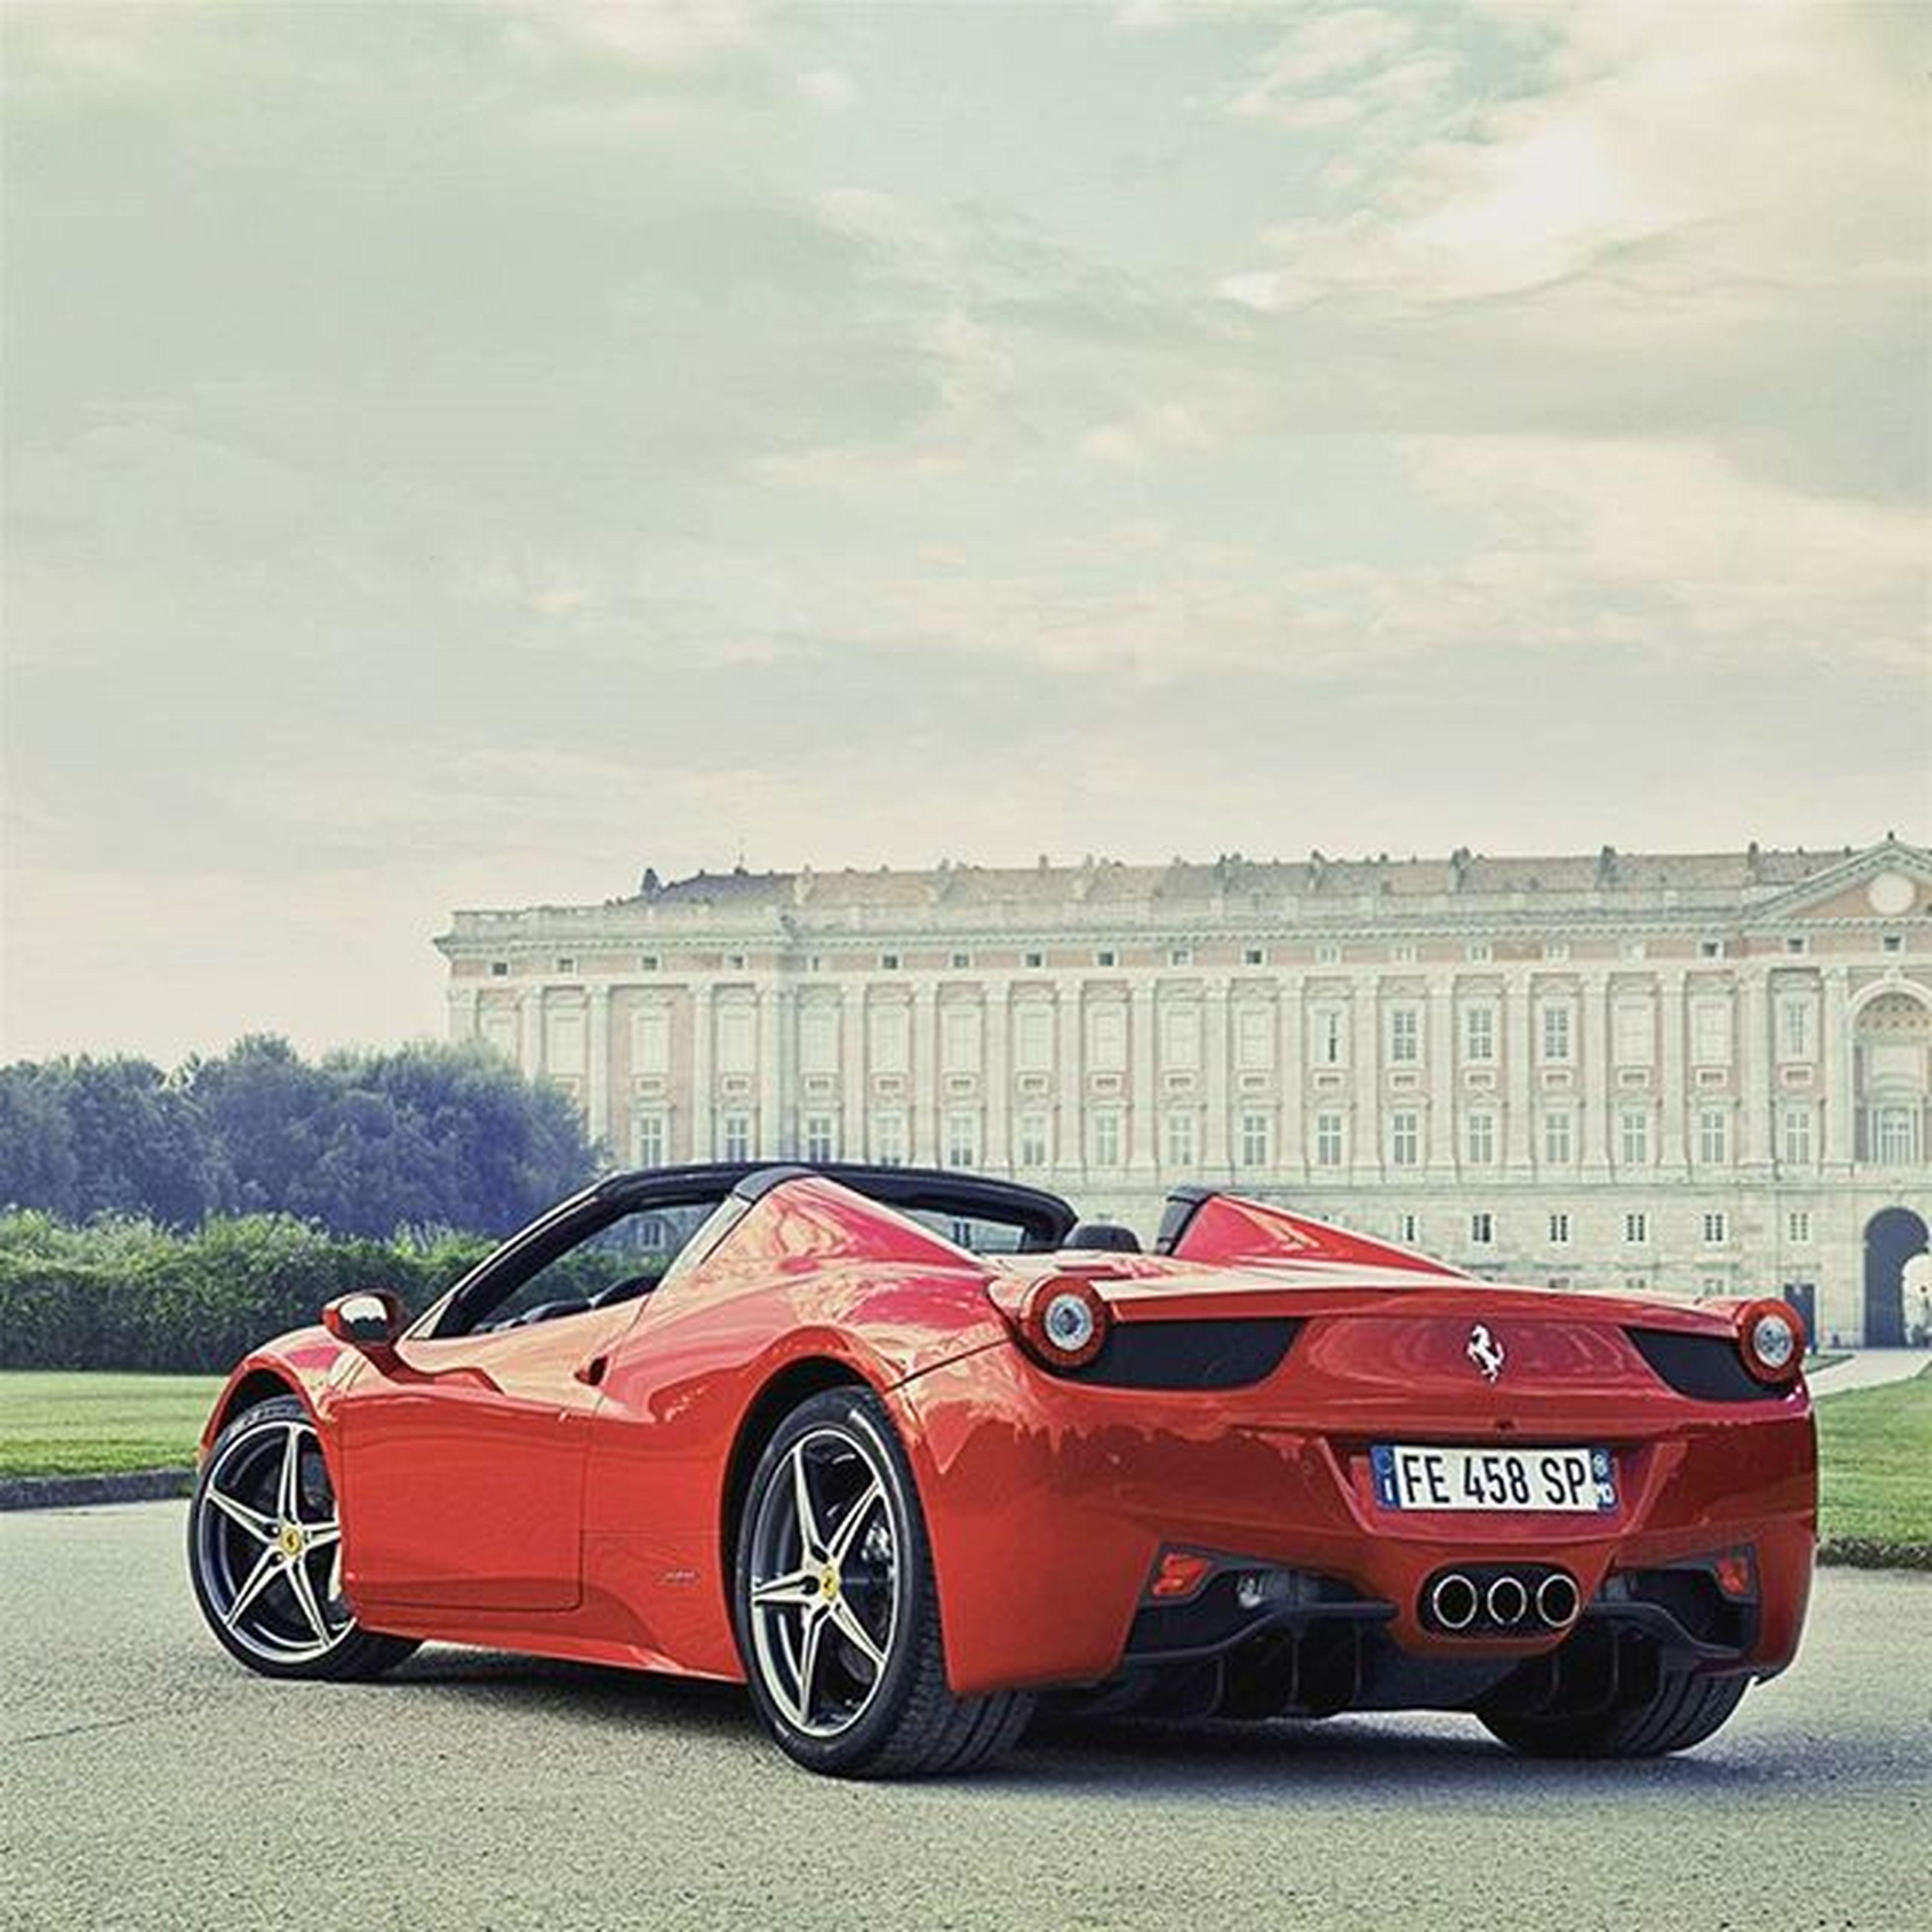 Wallpaper Ferrari Sport Cars Want To Buy This Photo